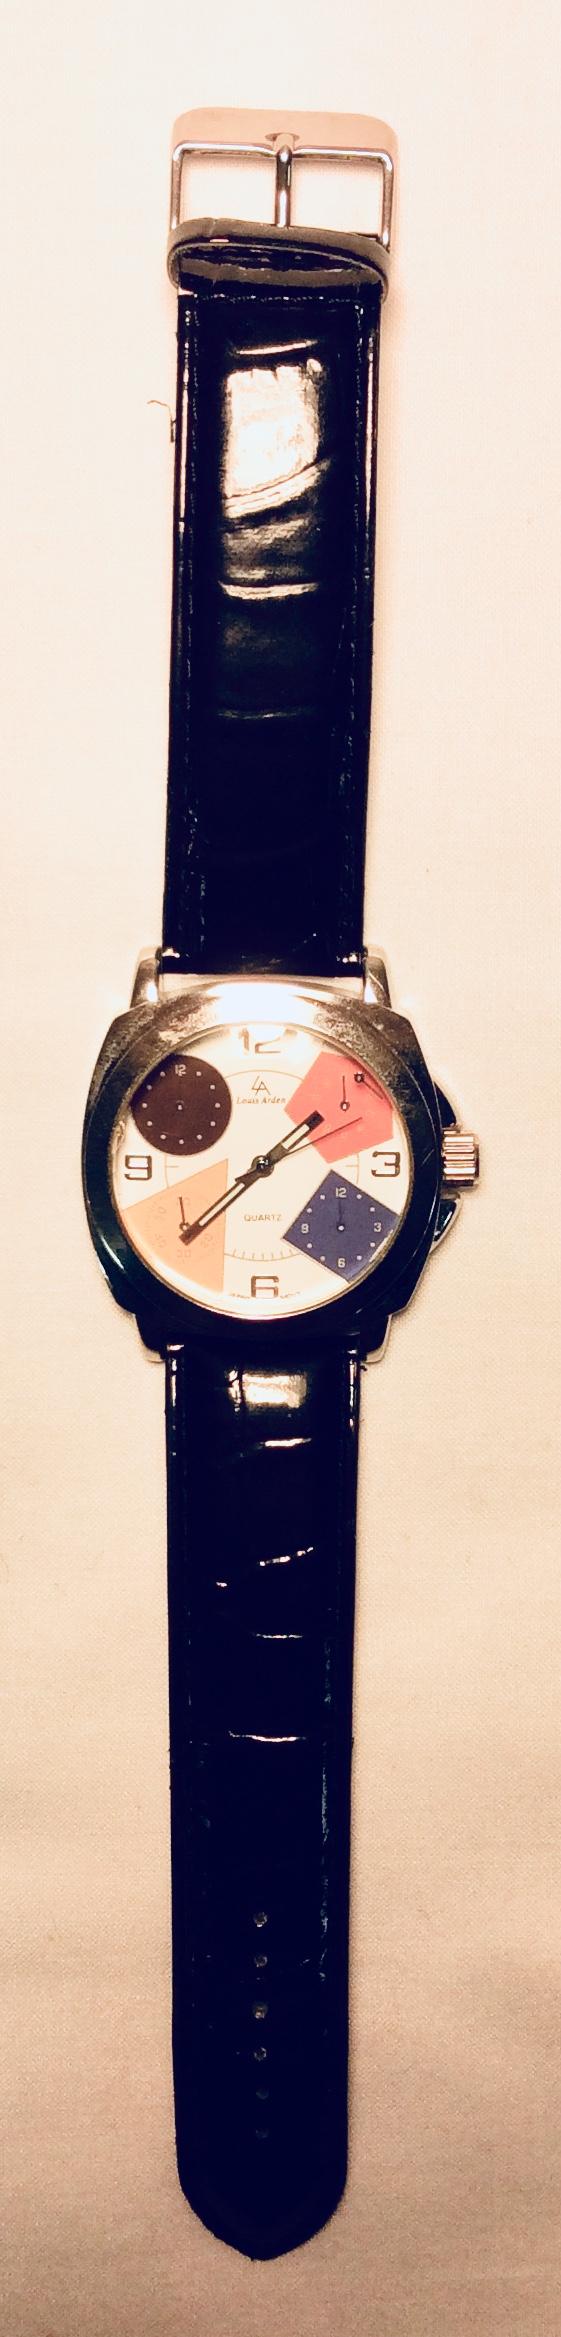 Geometric shapes watch